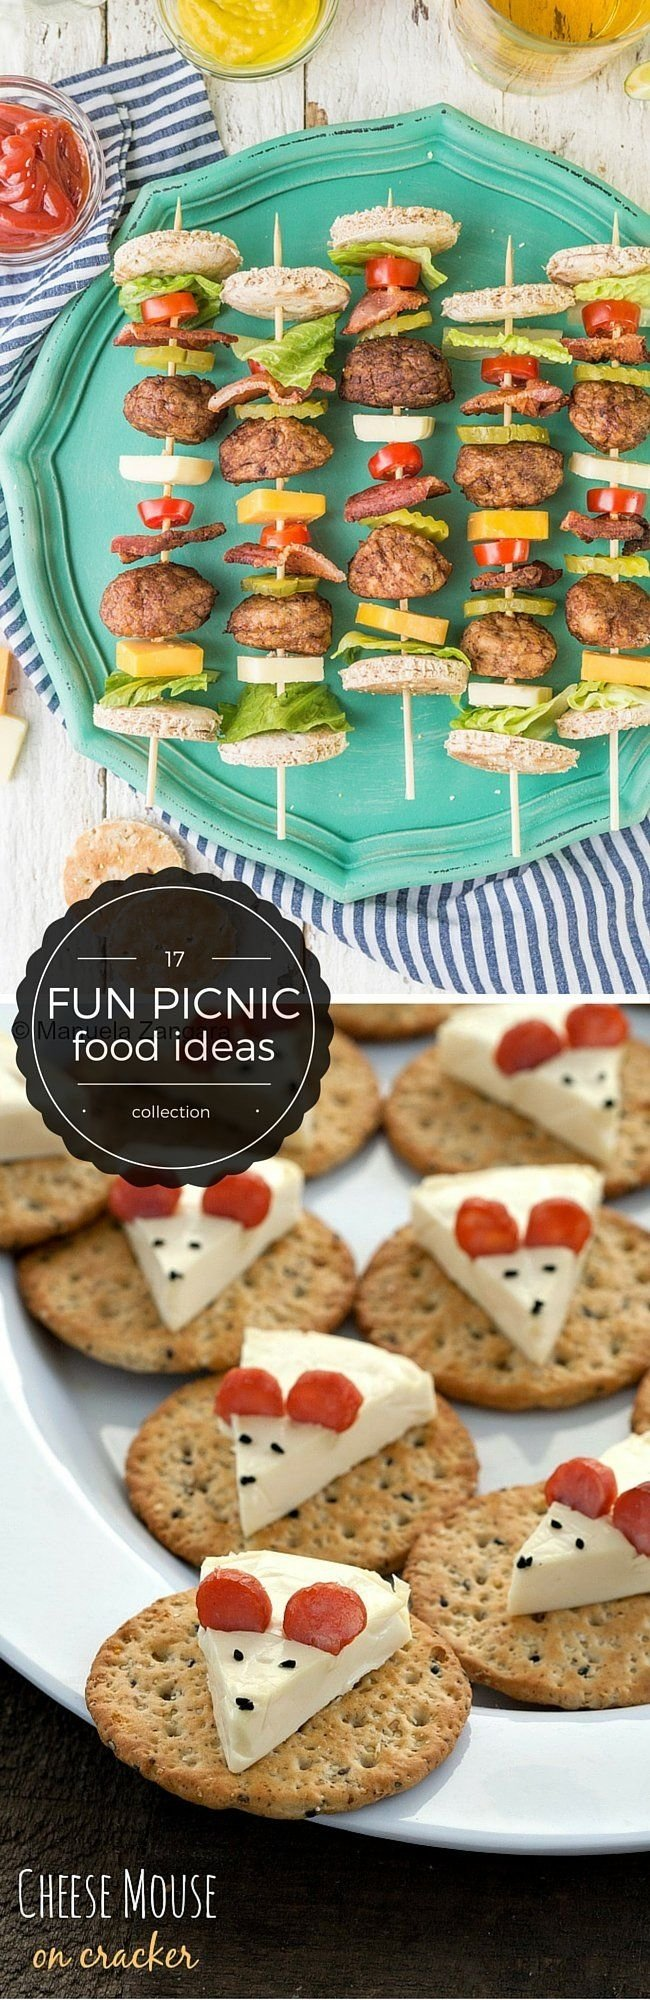 10 Beautiful Picnic Food Ideas For Couples 17 fun kid friendly picnic food ideas 2021